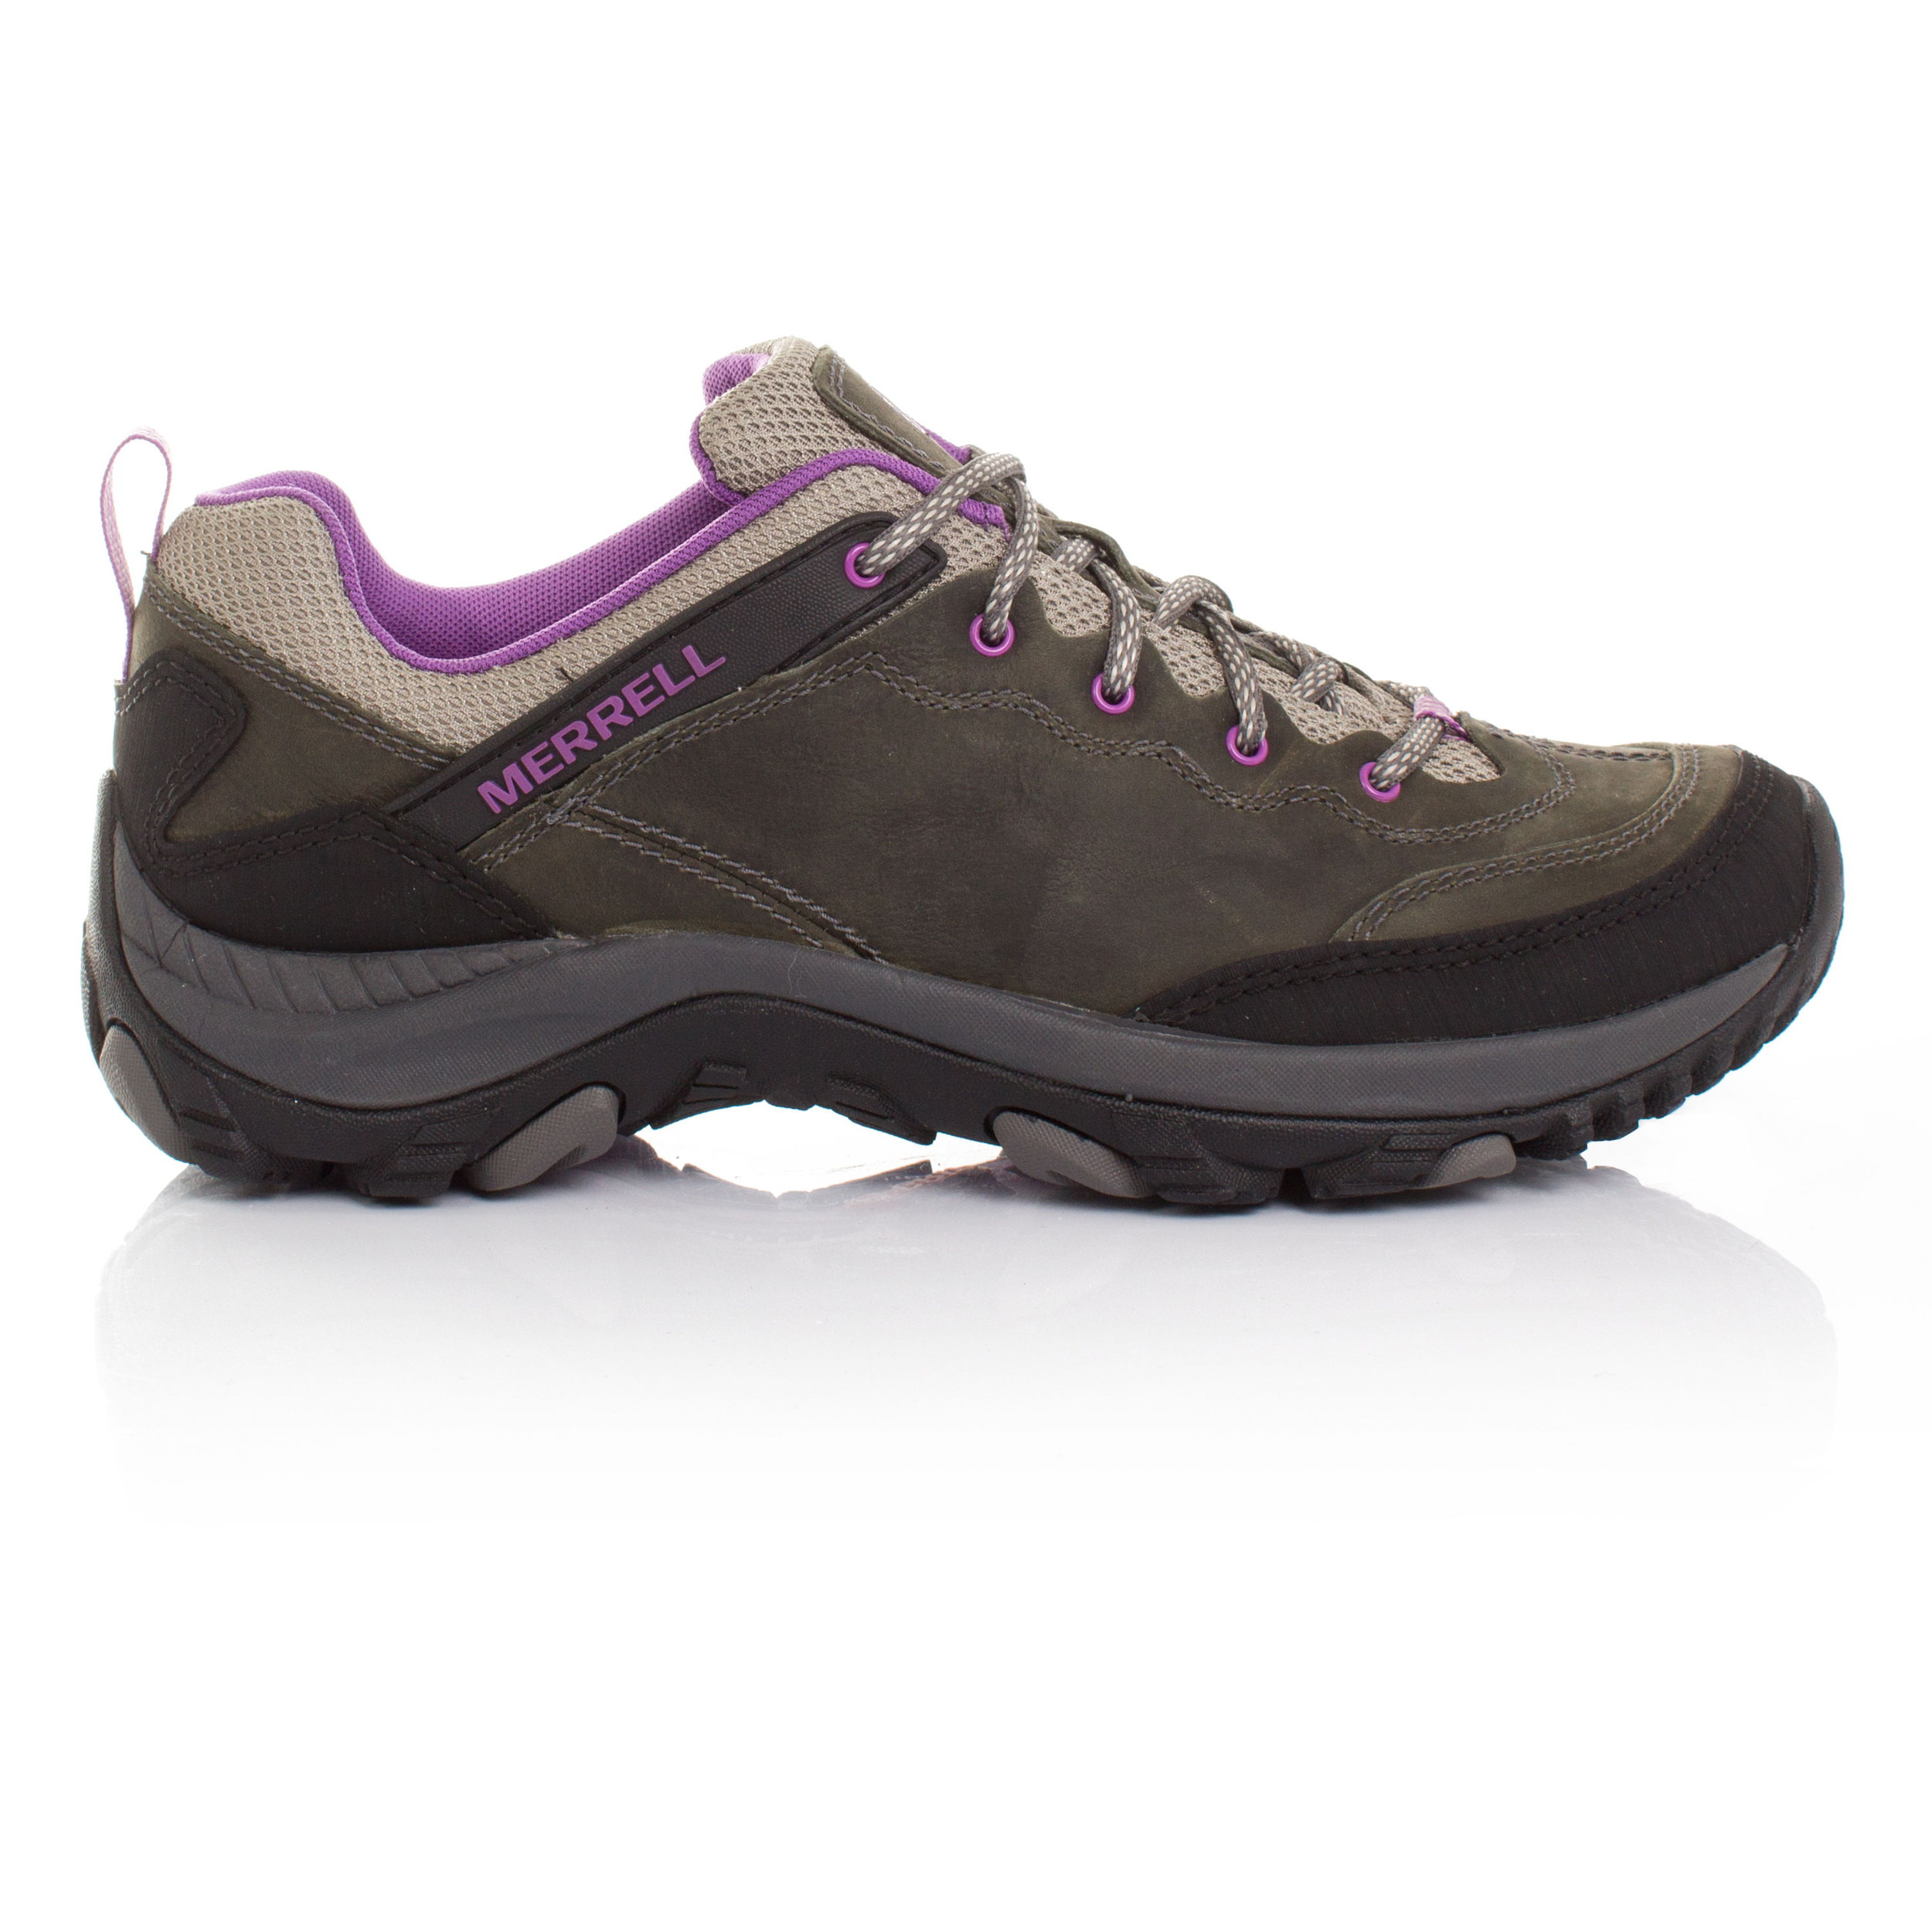 Zapatillas y zapatos Merrell Salida Trekker 5z1dOT2kkM